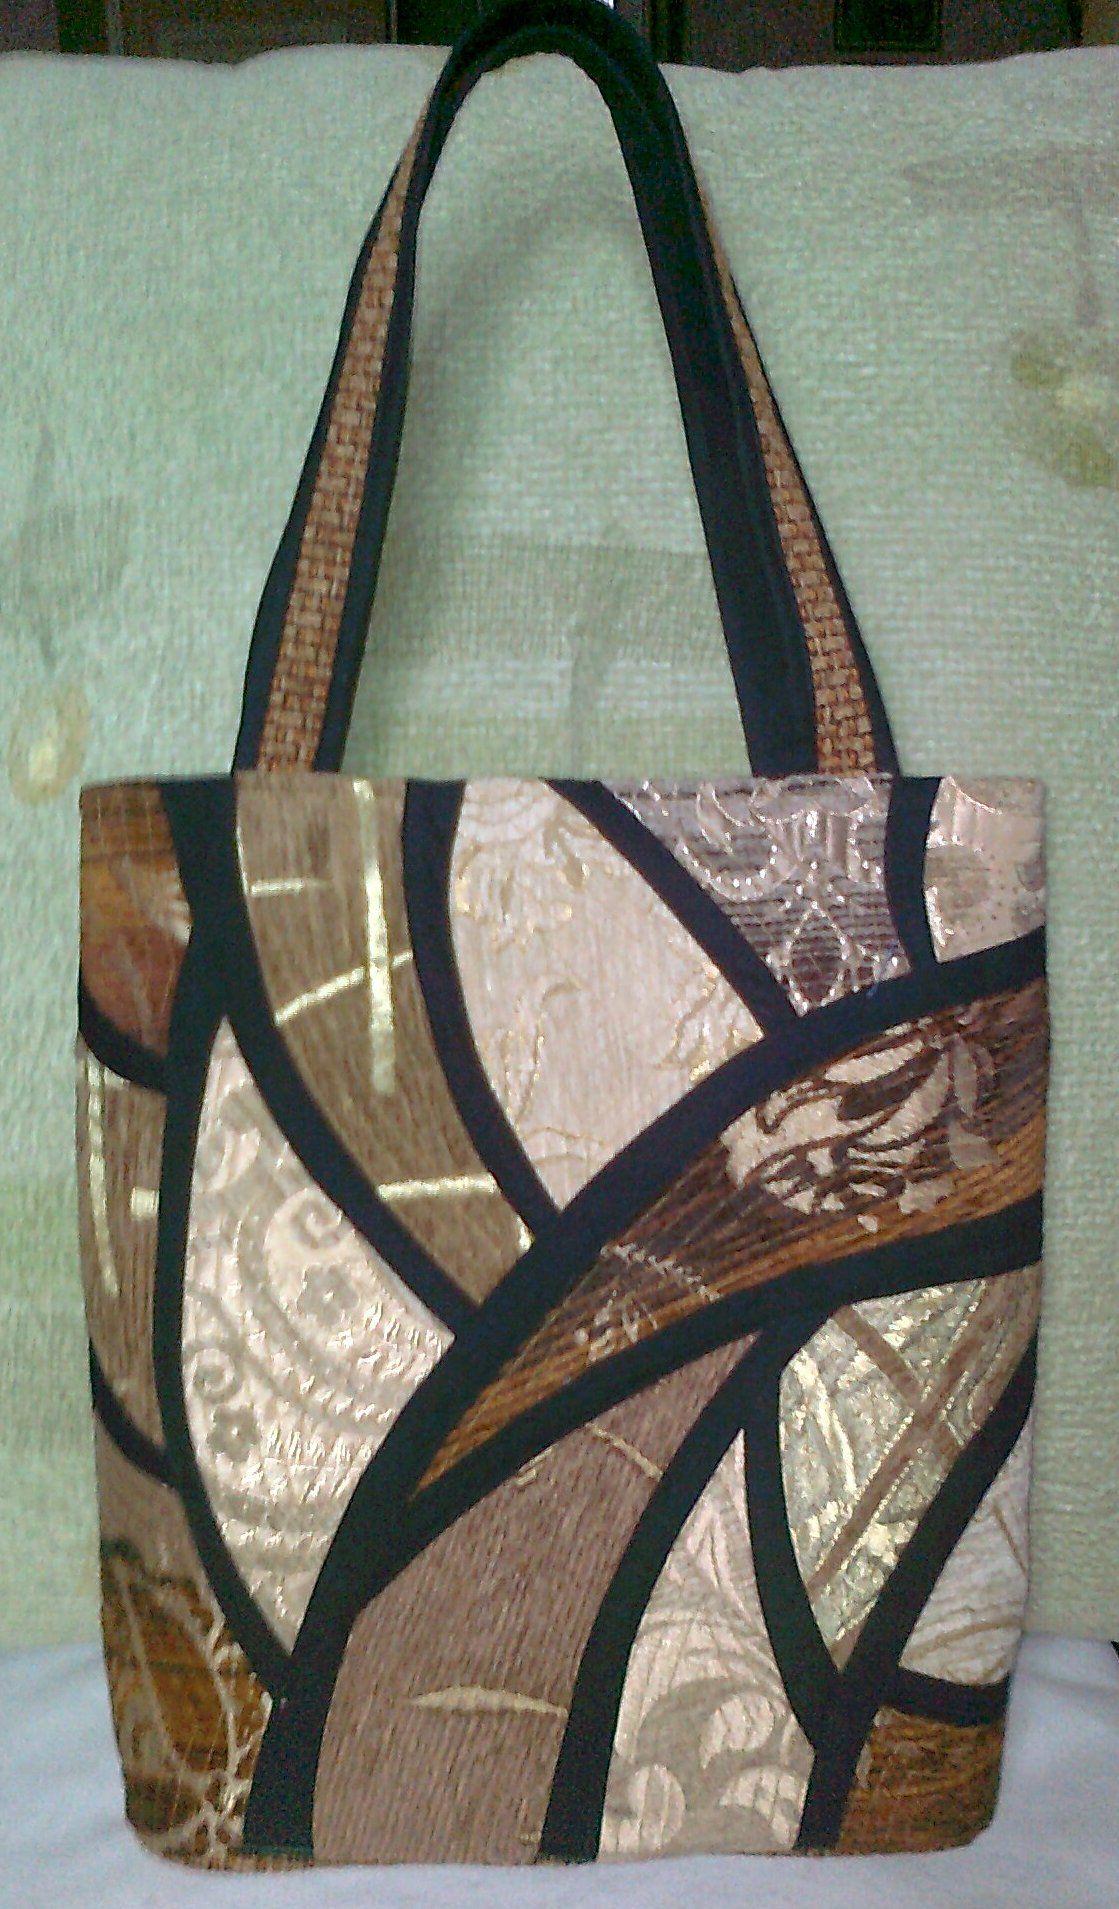 2995c2778 Bag Bolsas De Senhoritas, Bolsas Artesanales, Modelos De Bolsas, Bolsos De  Trapillo,